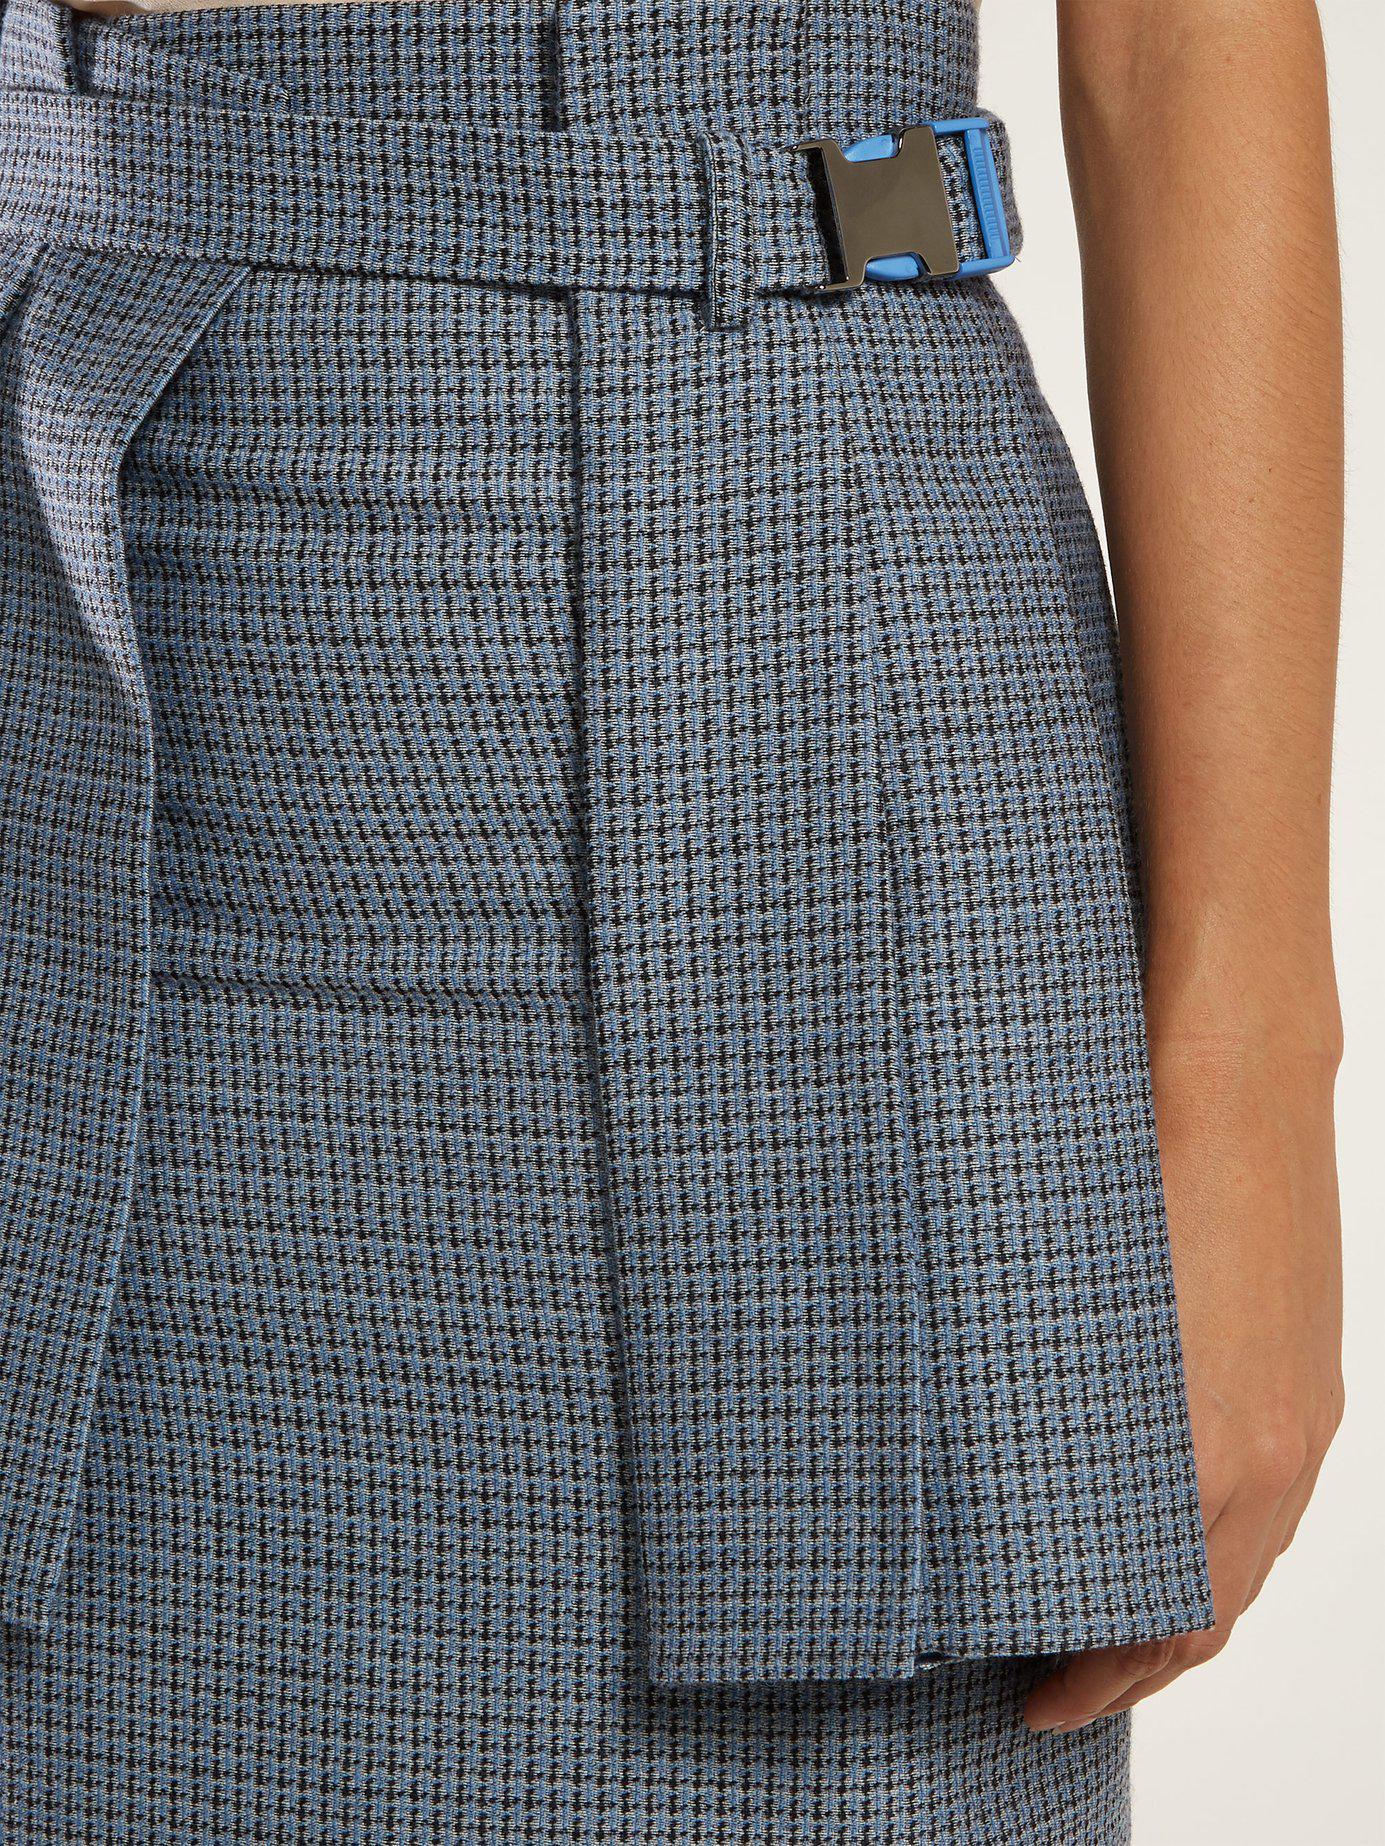 79c961ccf7 Fendi - Blue Pleated Panel Wool Blend Tweed Pencil Skirt - Lyst. View  fullscreen